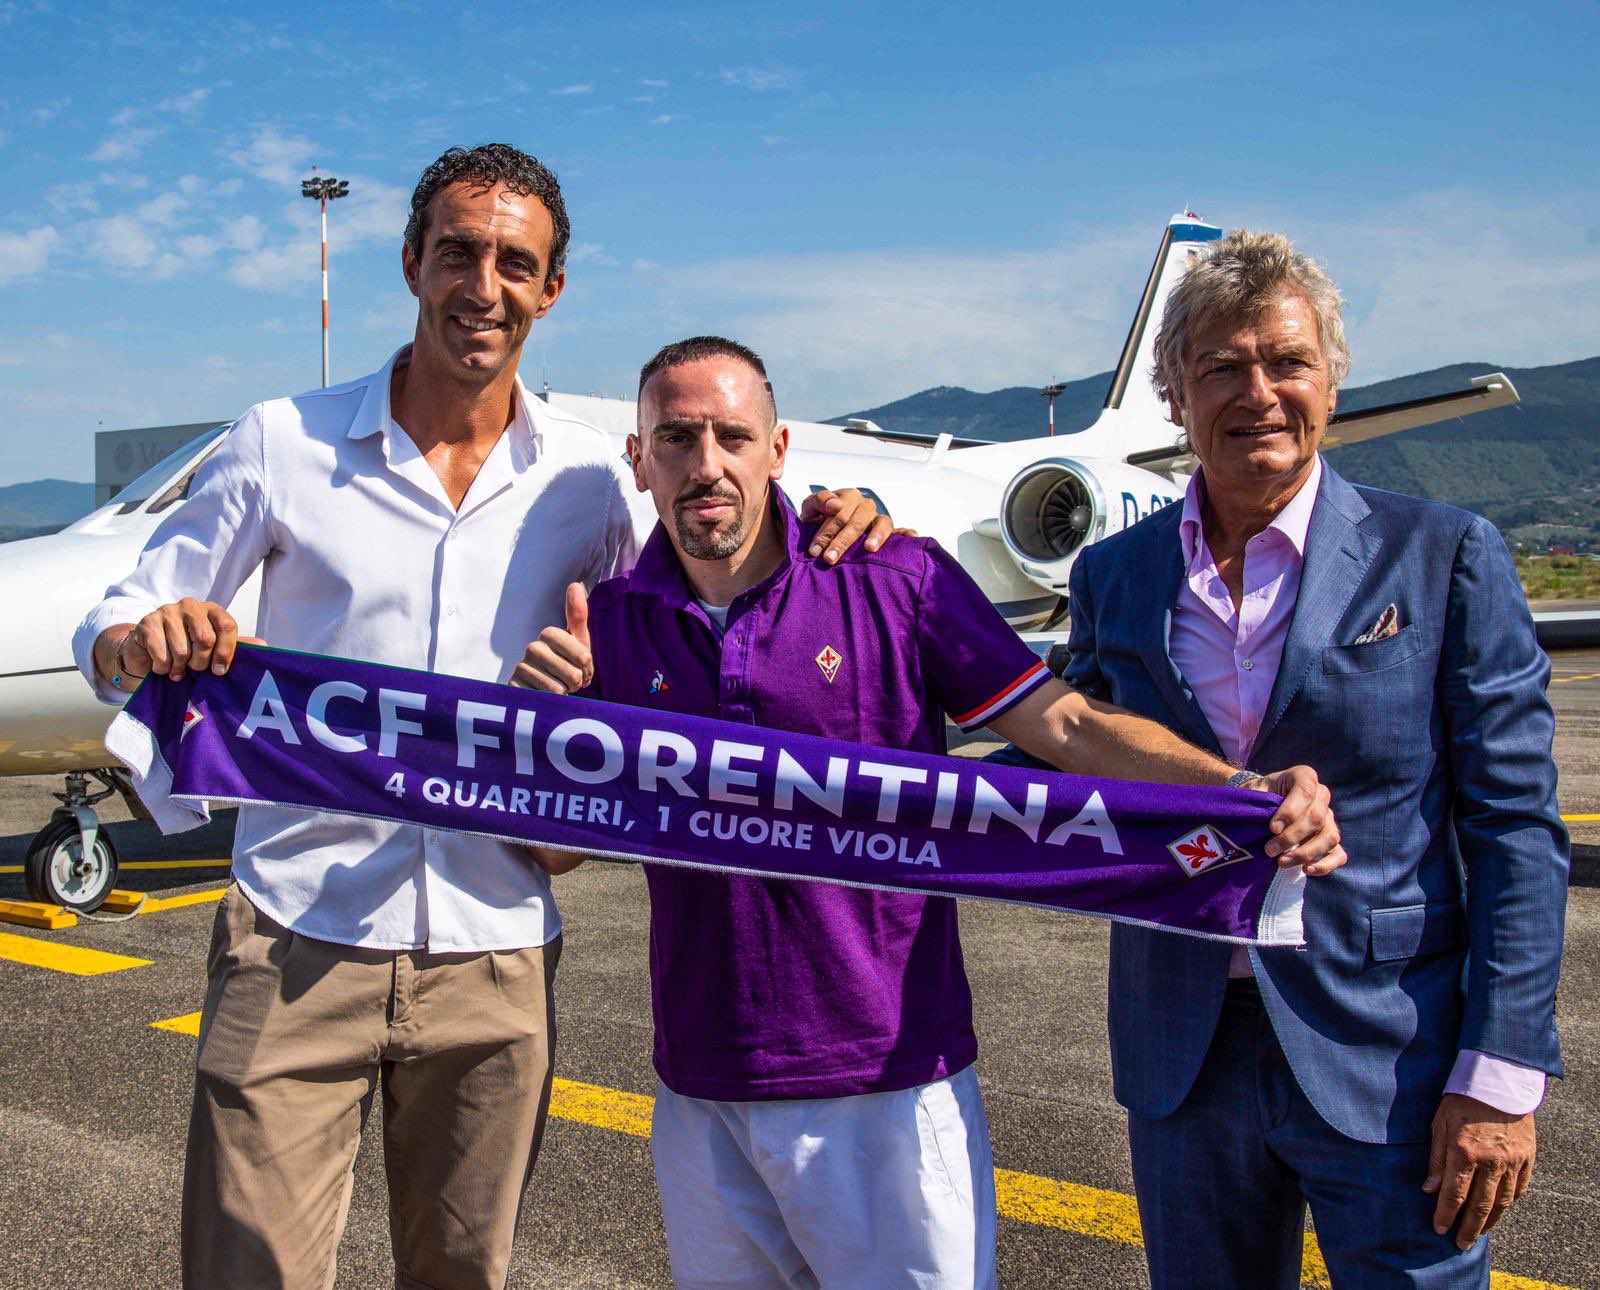 تفاصيل عقد دي ليخت مع نادي يوفنتوس الإيطالي